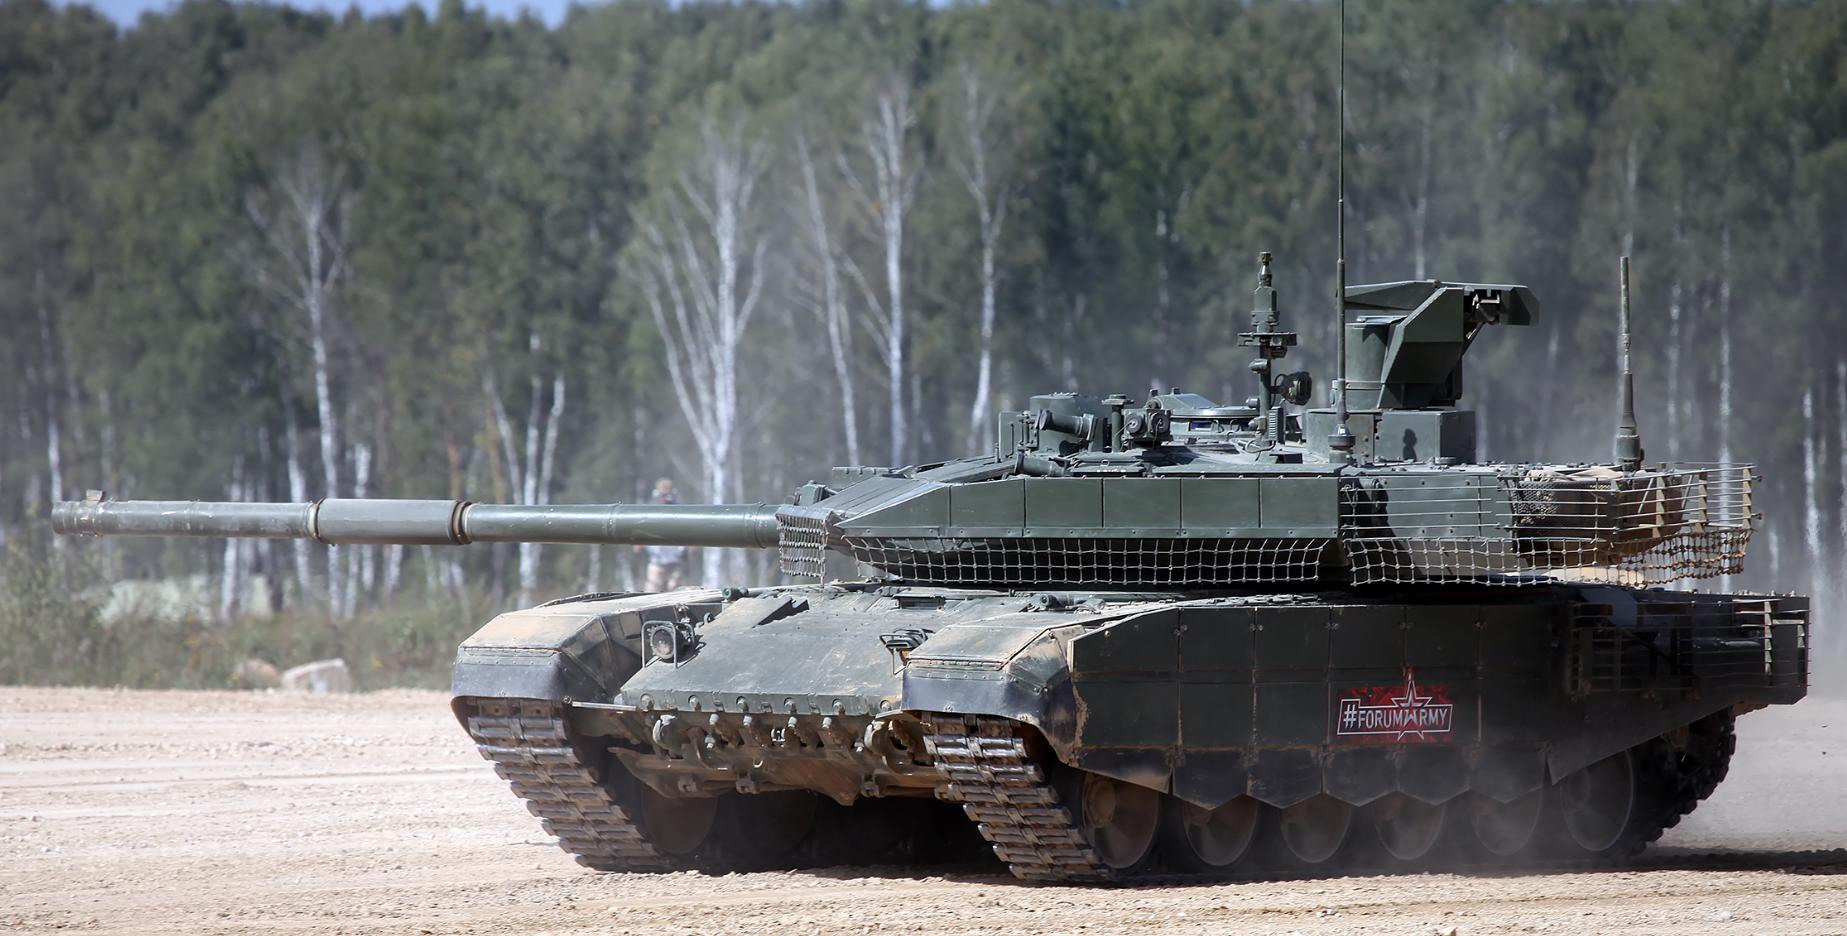 T-90 Main Battle Tank #2 - Page 6 Efbc500ffdee6cfe5c097e0db570f8e2